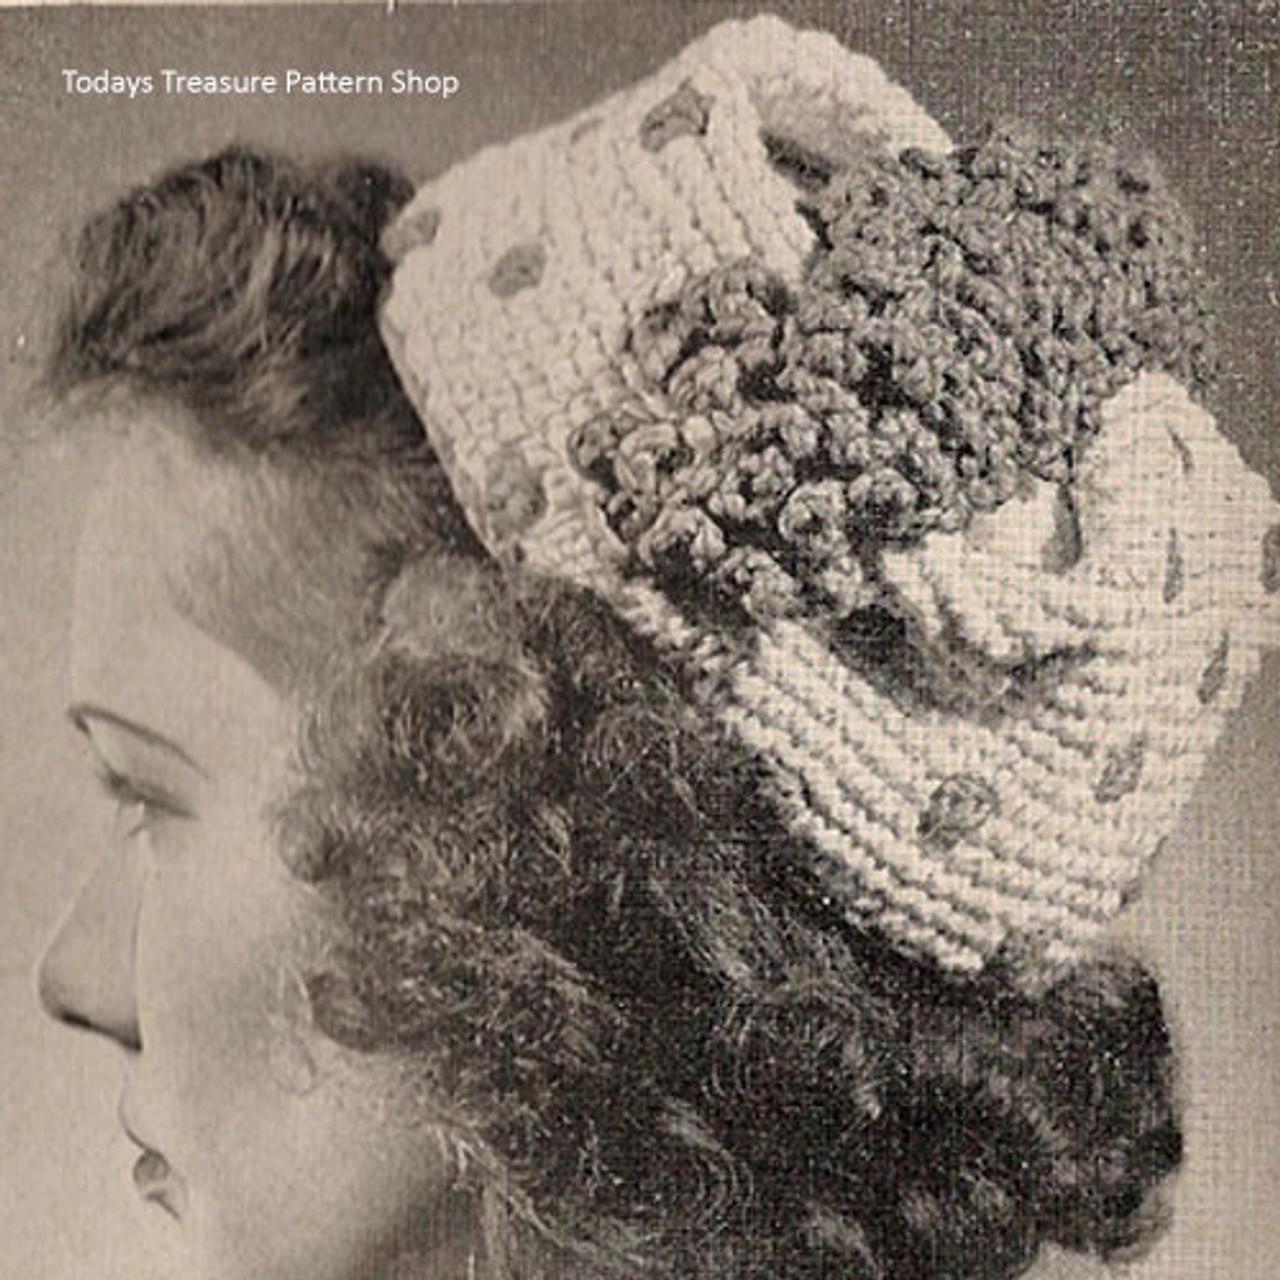 Vintage Polka Dot Pillbox Crochet Pattern with Flower band